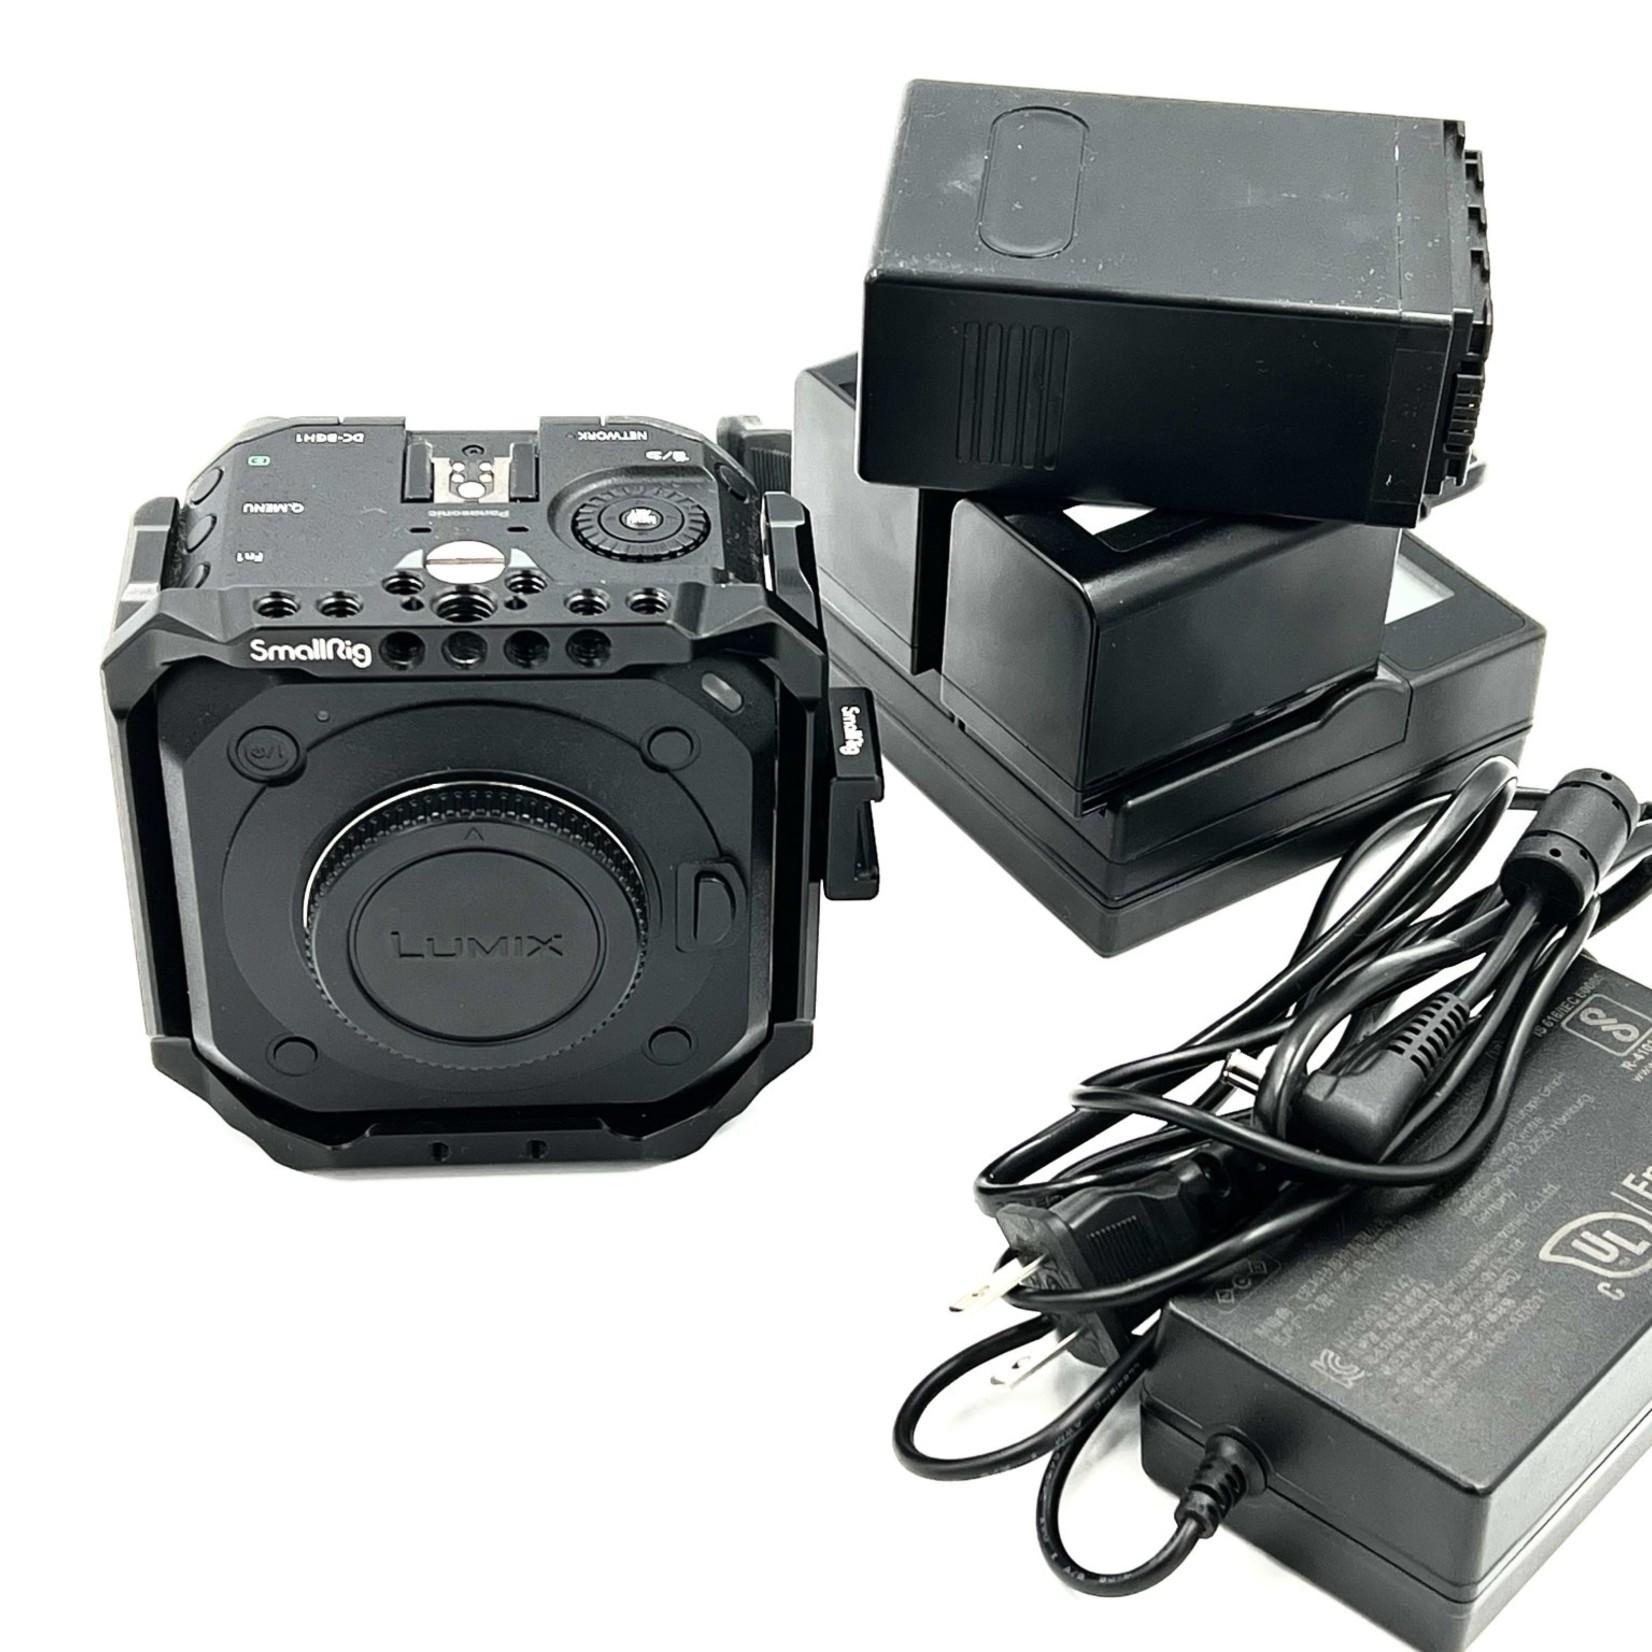 Panasonic Panasonic Lumix DC-BGH1 Cinema 4K Box Camera